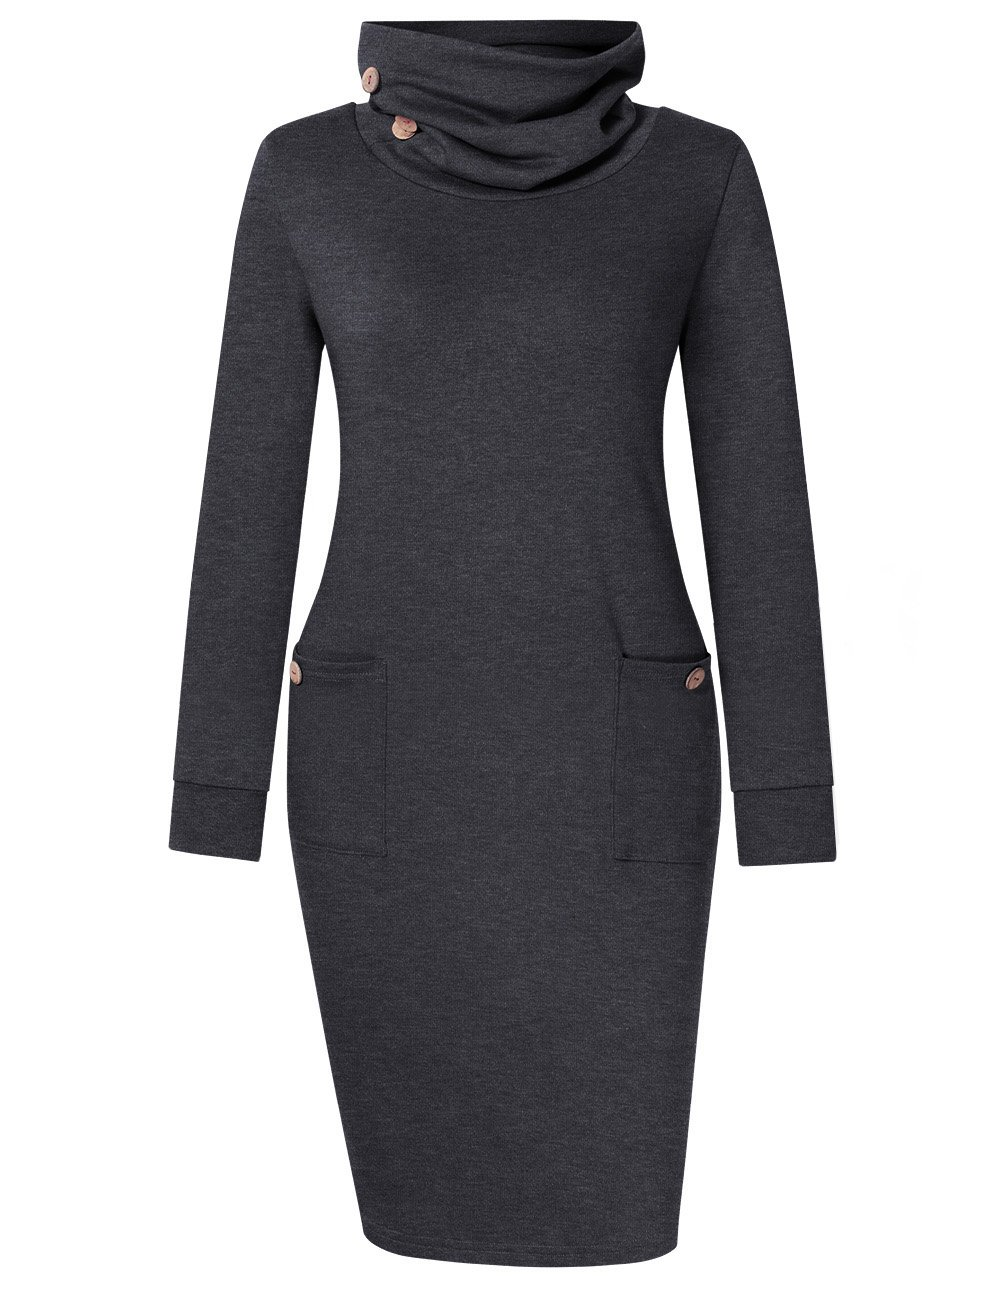 VeryAnn Womens Comfy Cowl Neck Tunic Sweatshirt Dress with Pockets Grey L